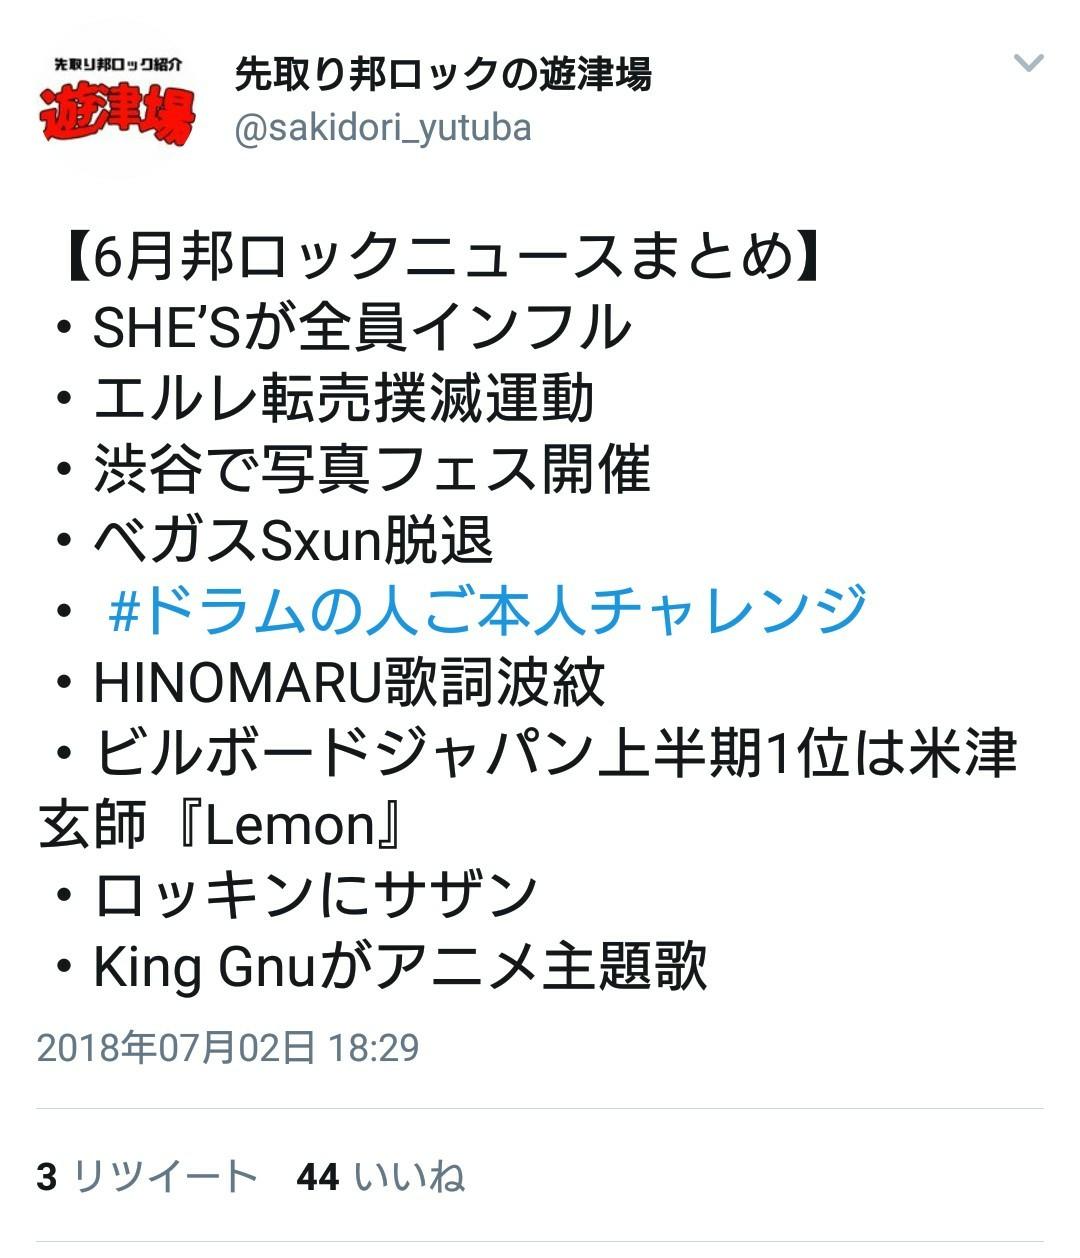 f:id:sakidoriyutsubarock:20181213223736j:plain